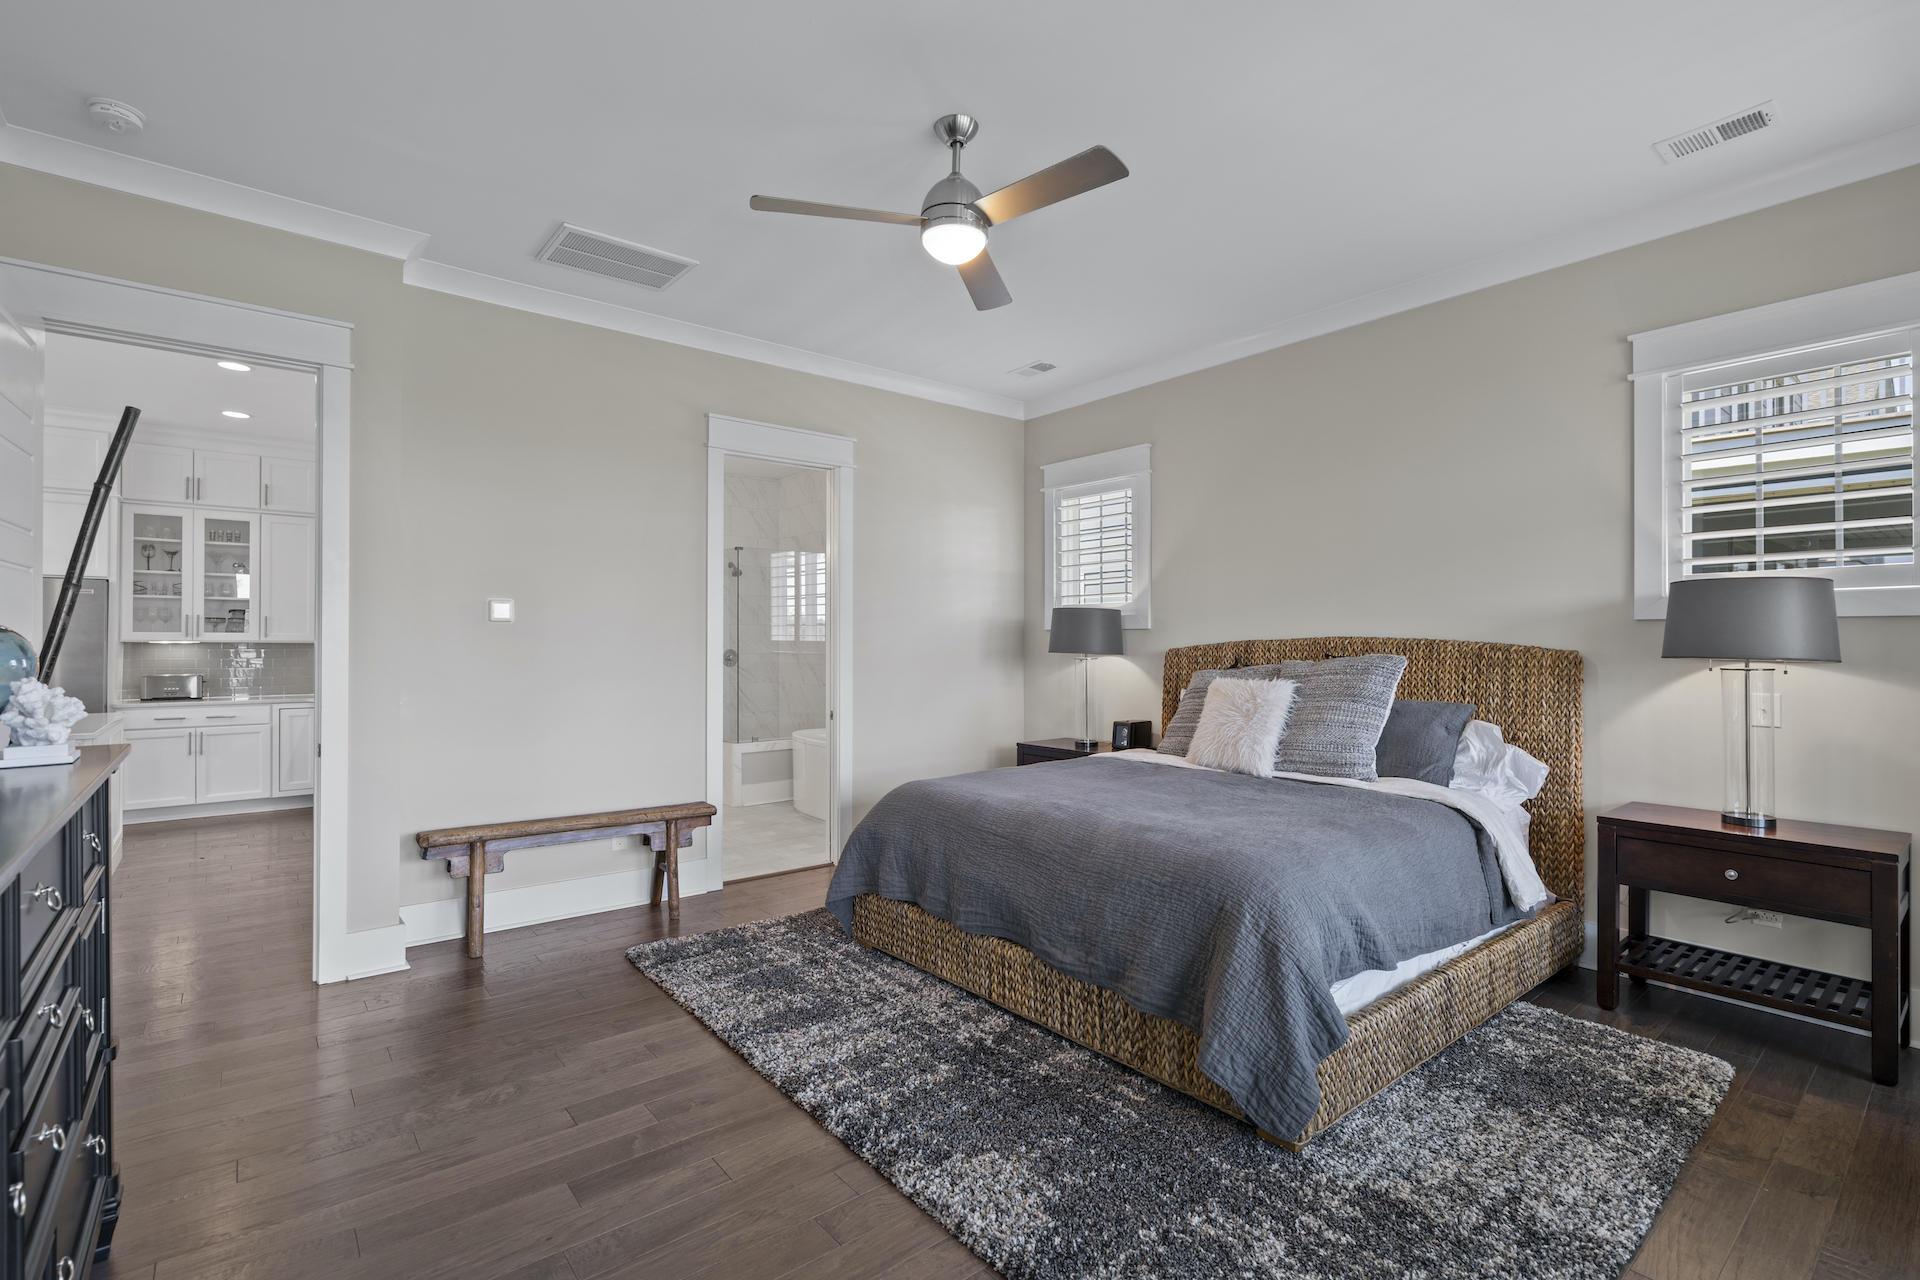 Dunes West Homes For Sale - 2316 Bucktail, Mount Pleasant, SC - 39